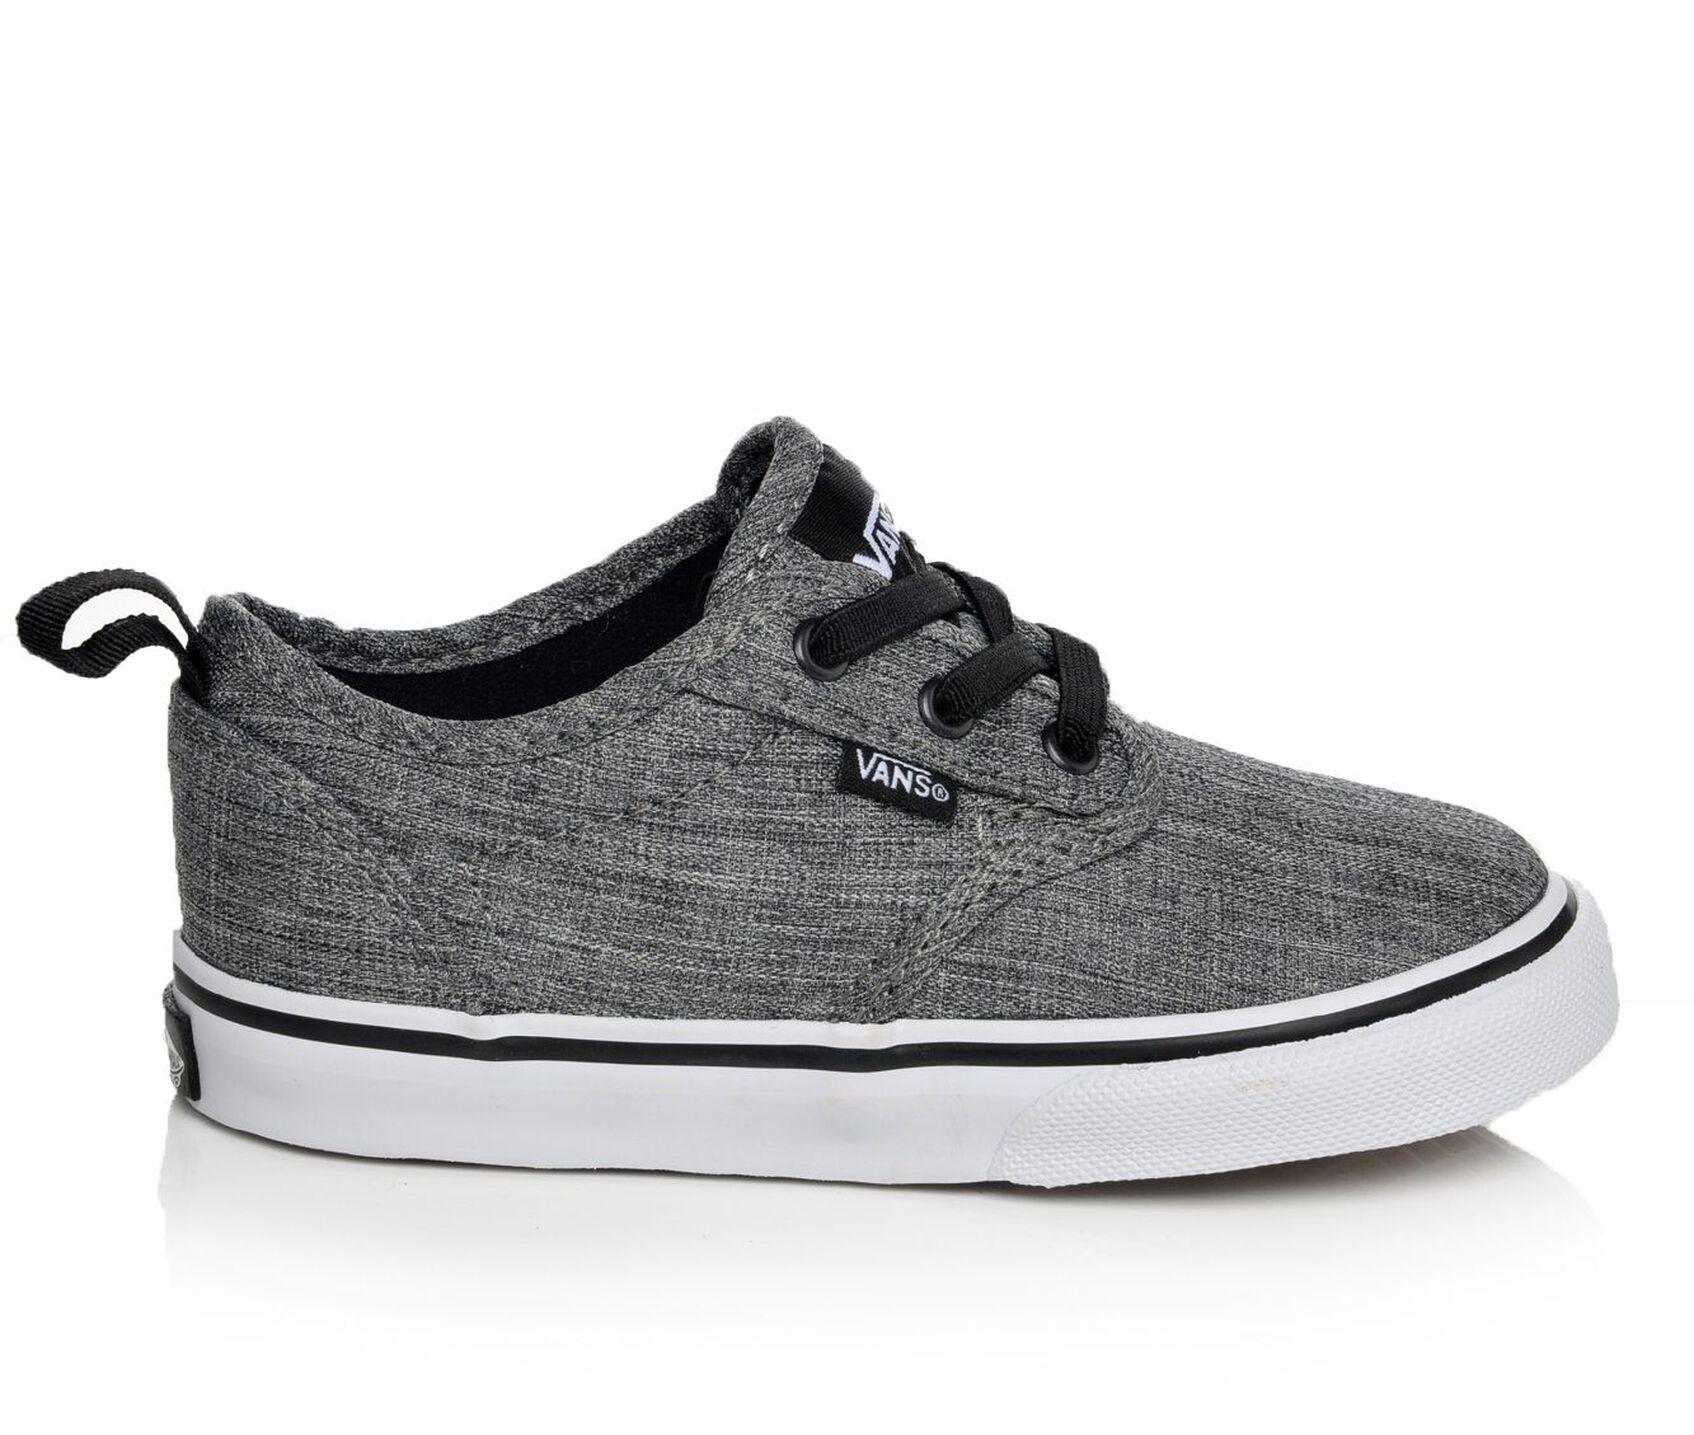 56de878d5fb Boys  Vans Toddler Atwood Slip-On Sneakers